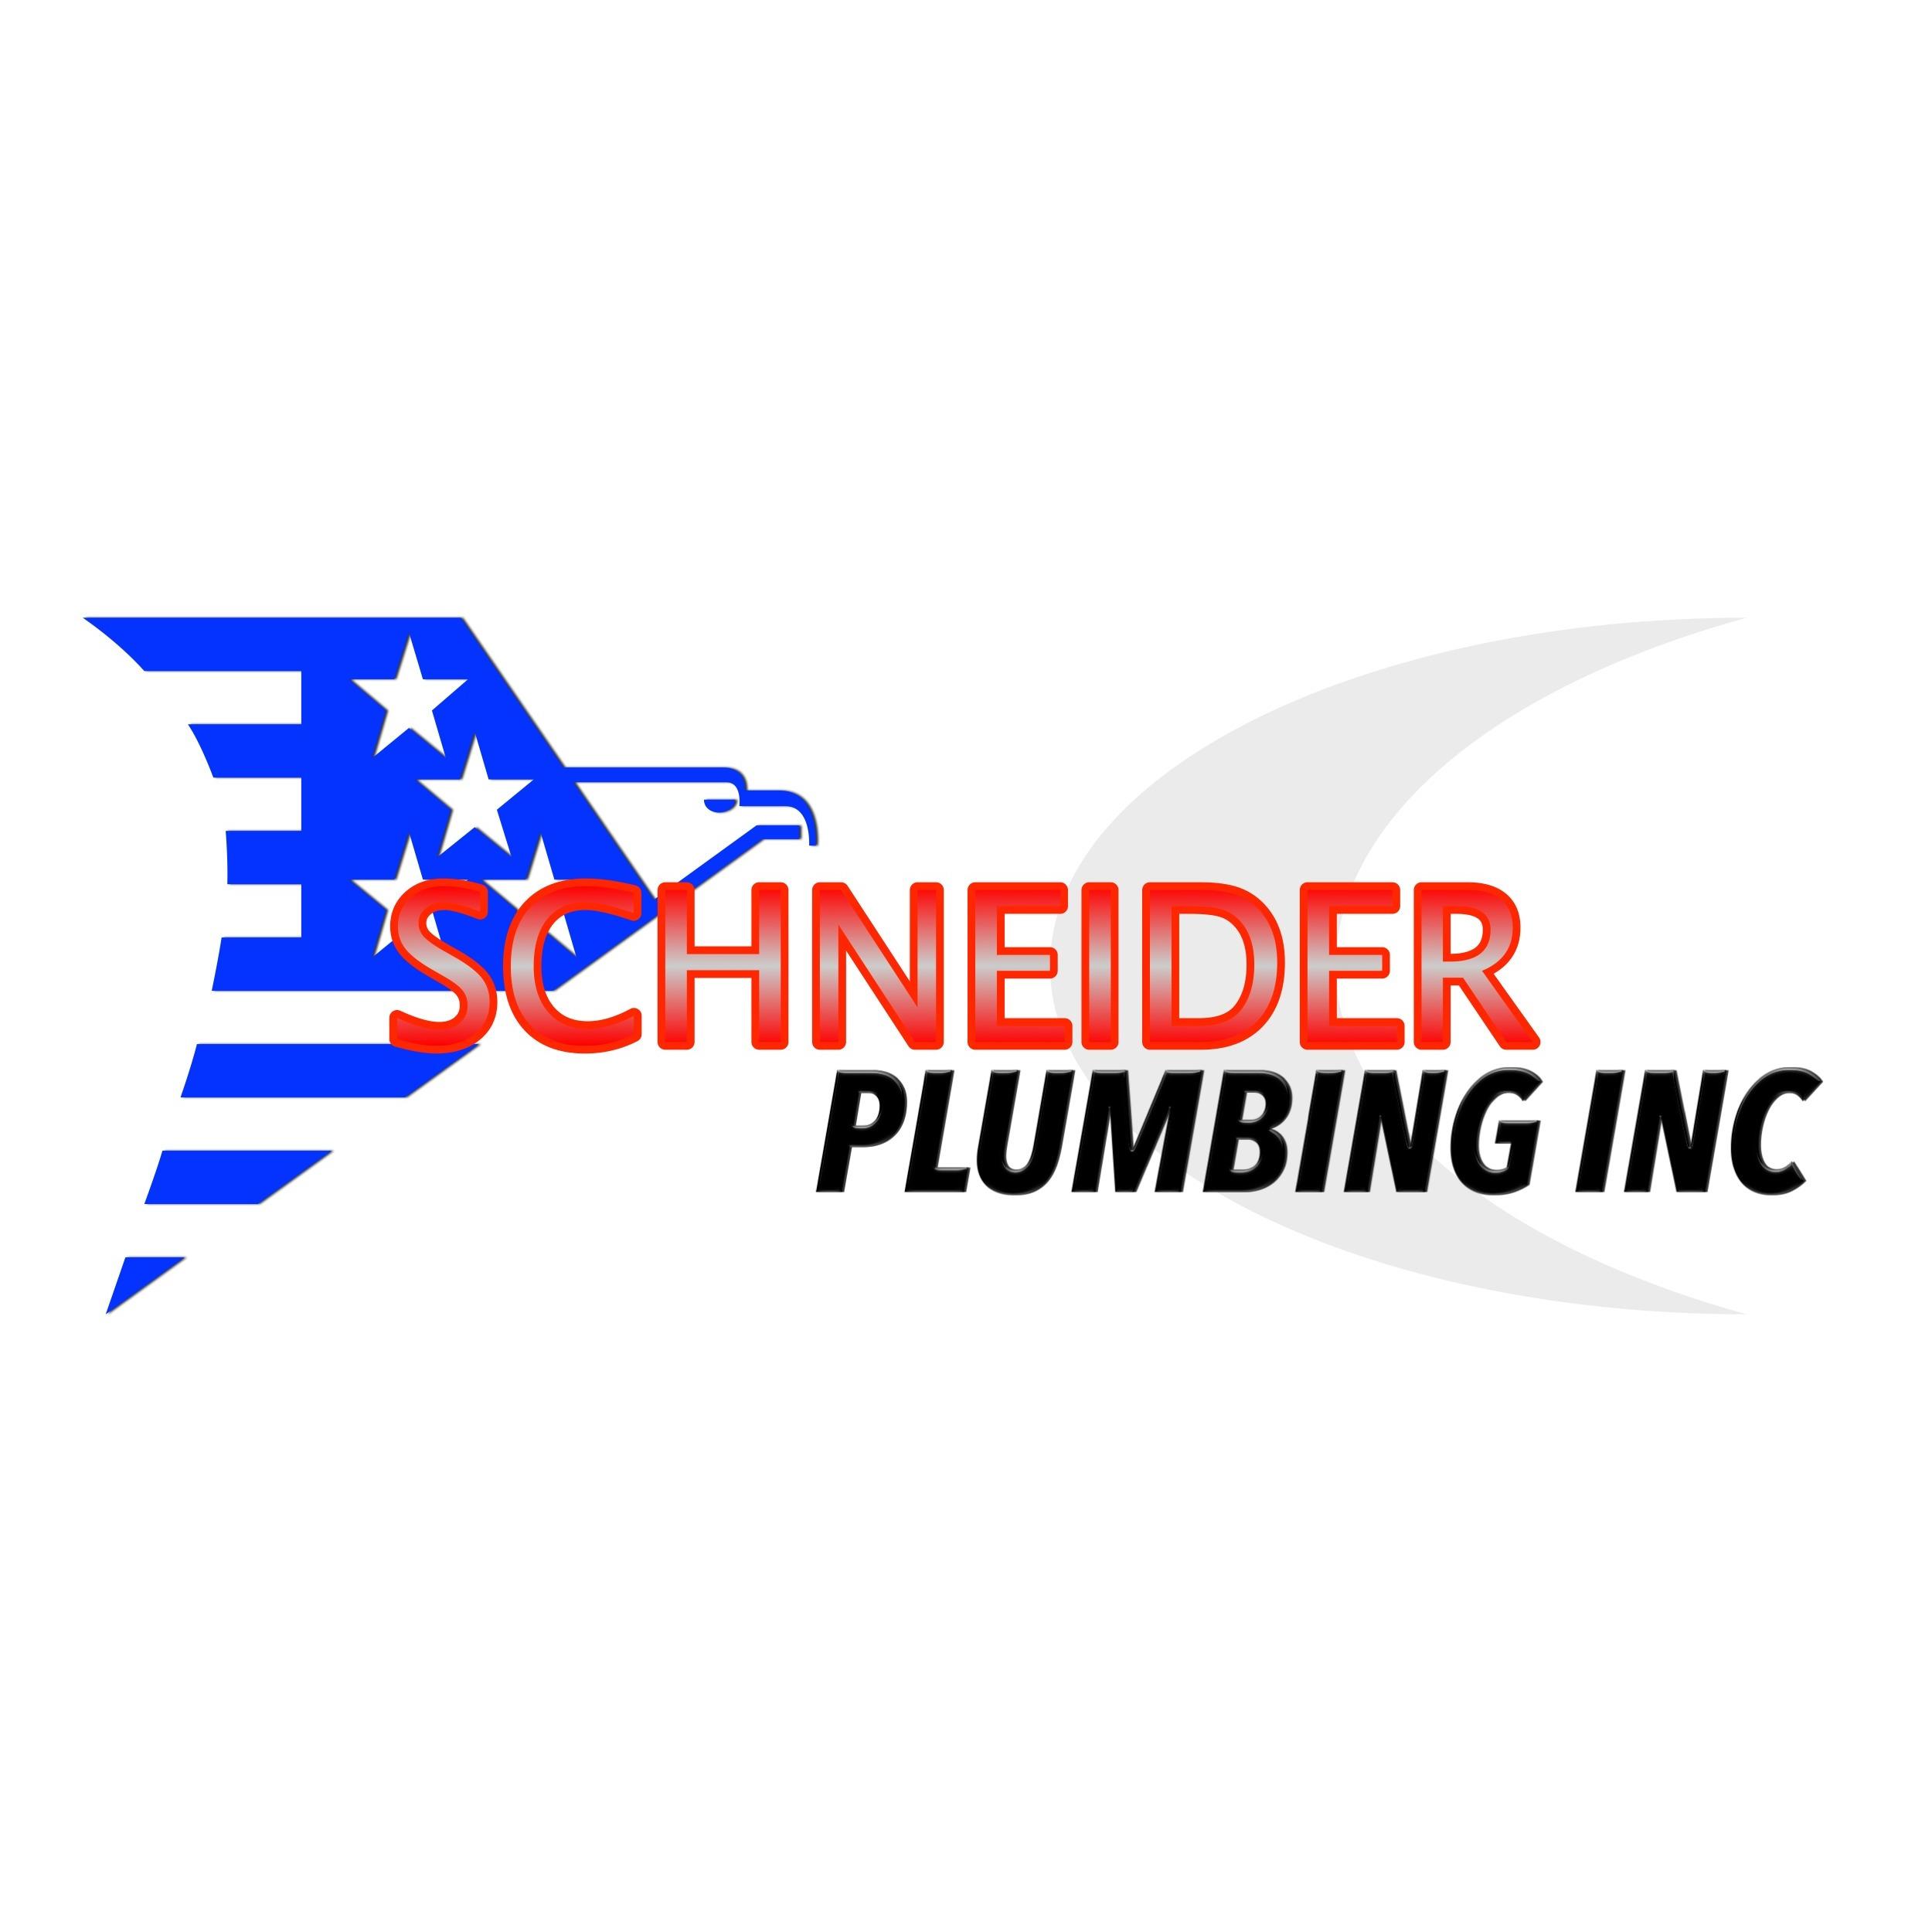 Schneider Plumbing, Inc.